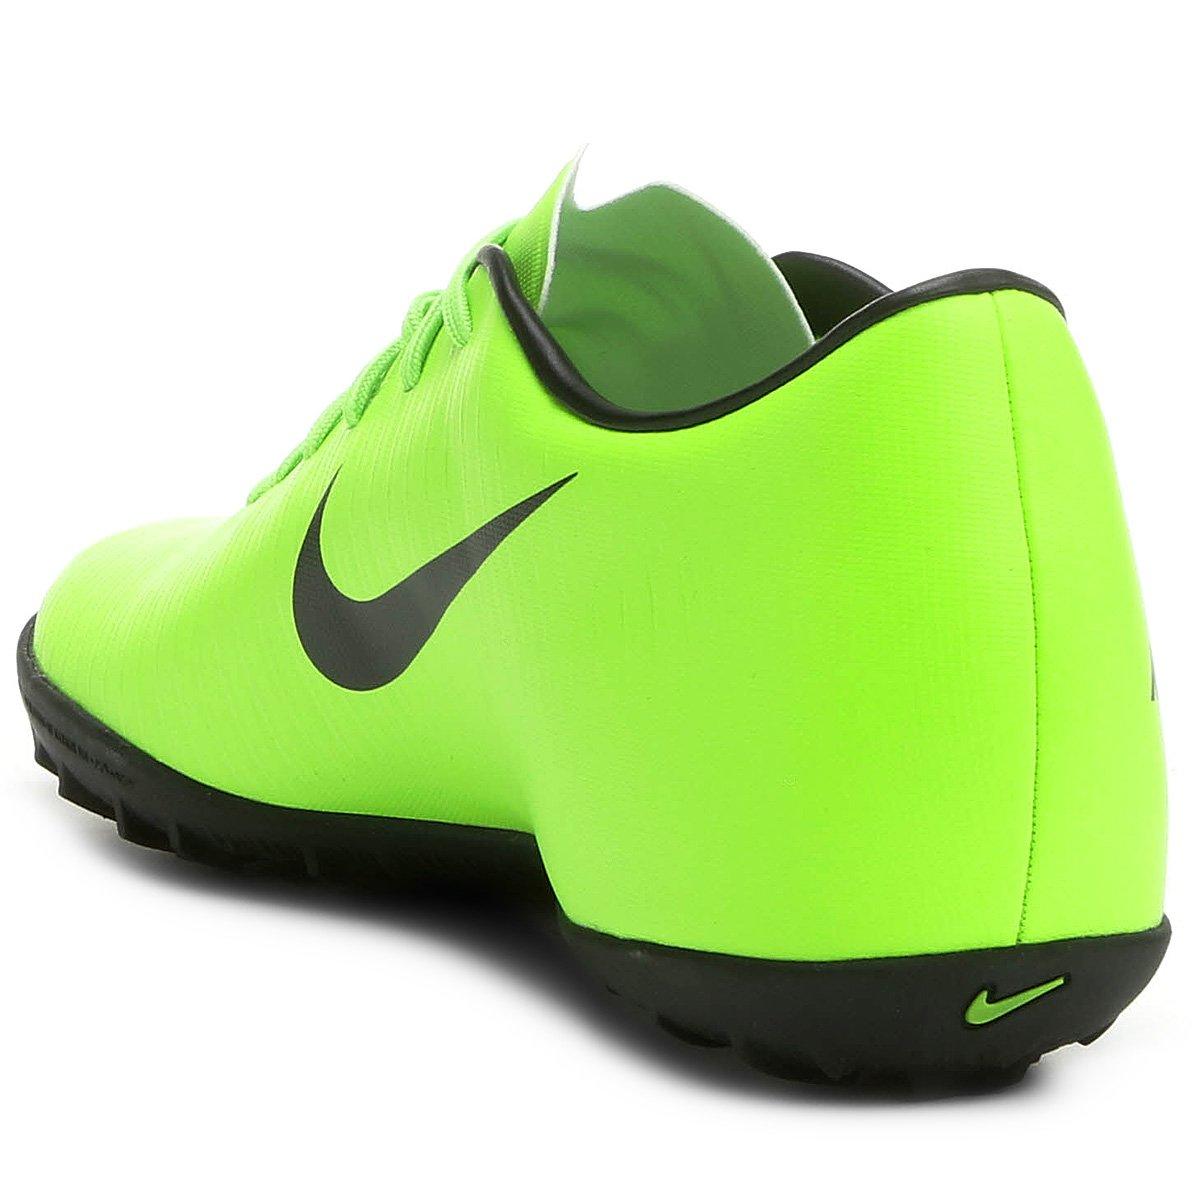 9f0e7c8f59 Chuteira Society Nike Mercurial Victory 6 TF - Compre Agora